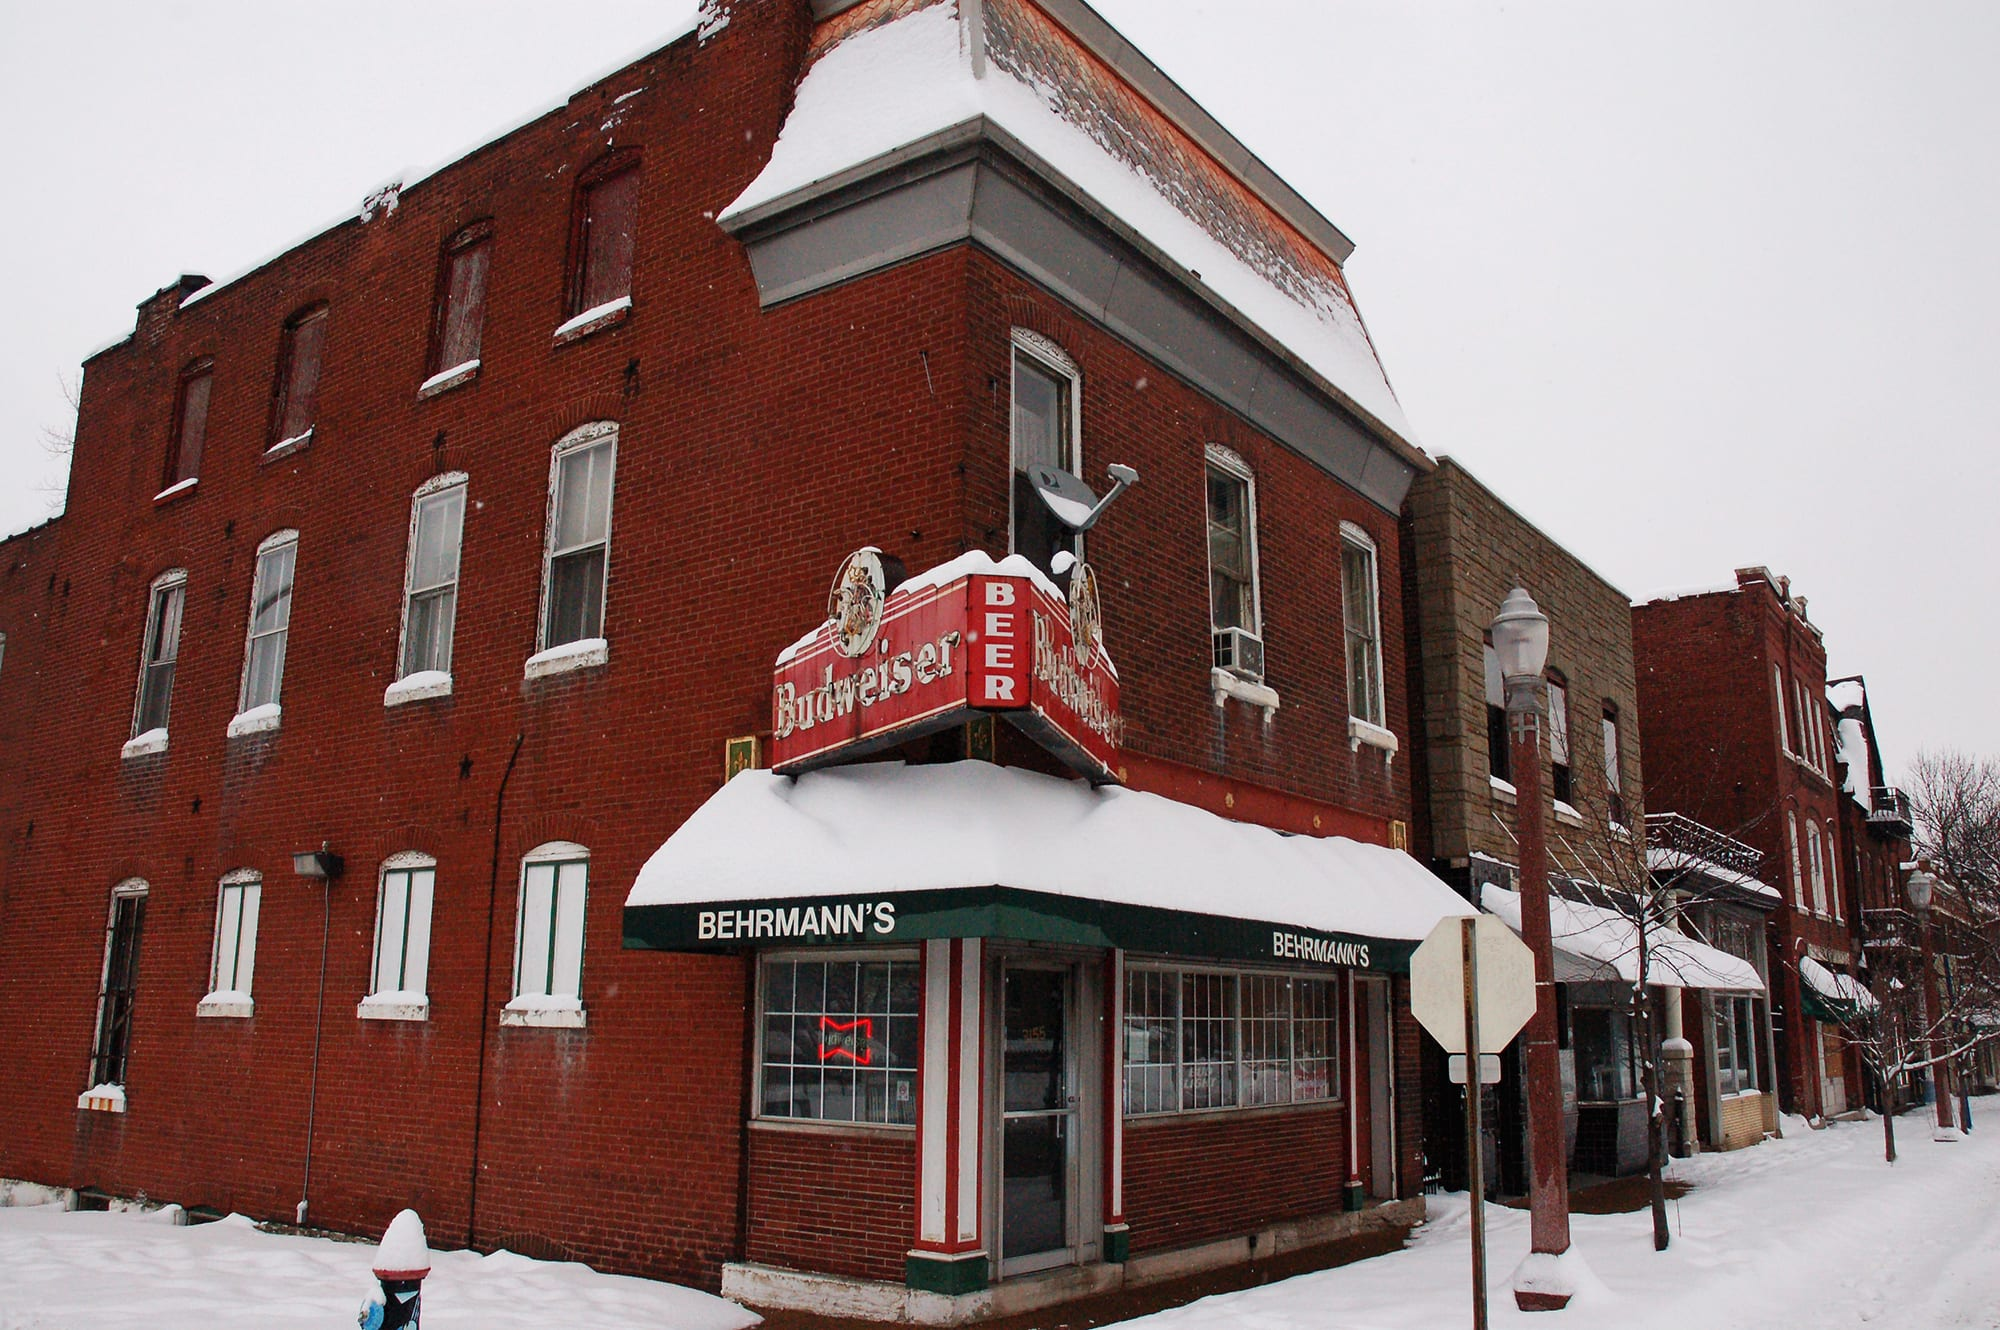 Behrmann's Tavern in the snow.